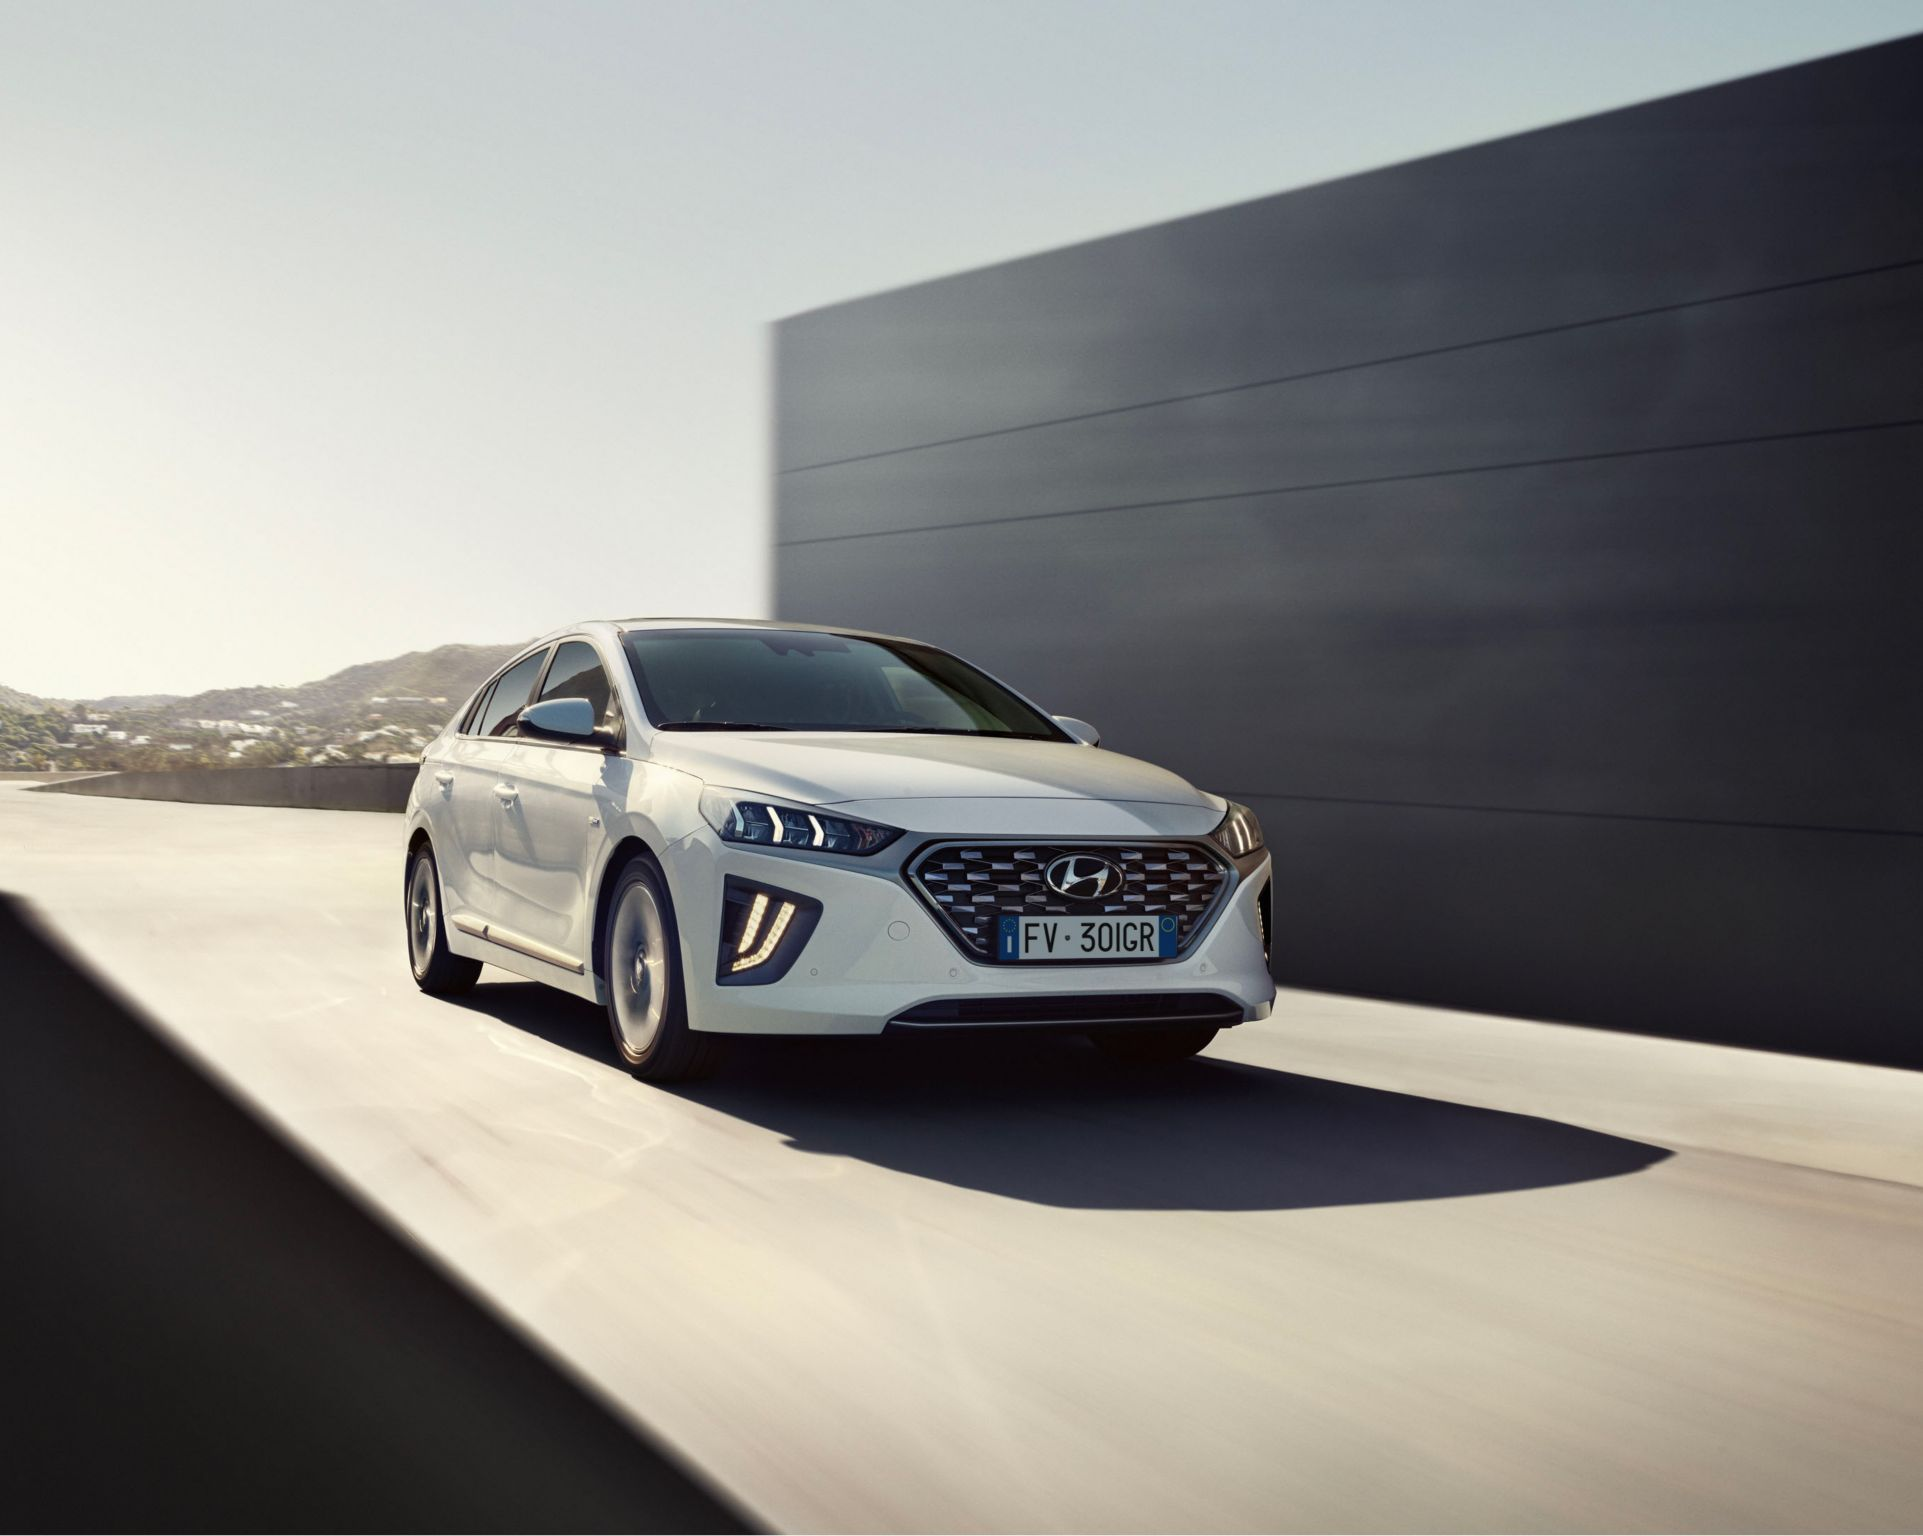 Hyundai 1.6 Hybrid DCT Prime (Benzina-Elettrica Hybrid) - Dimensioni, Consumi e Dotazioni di serie